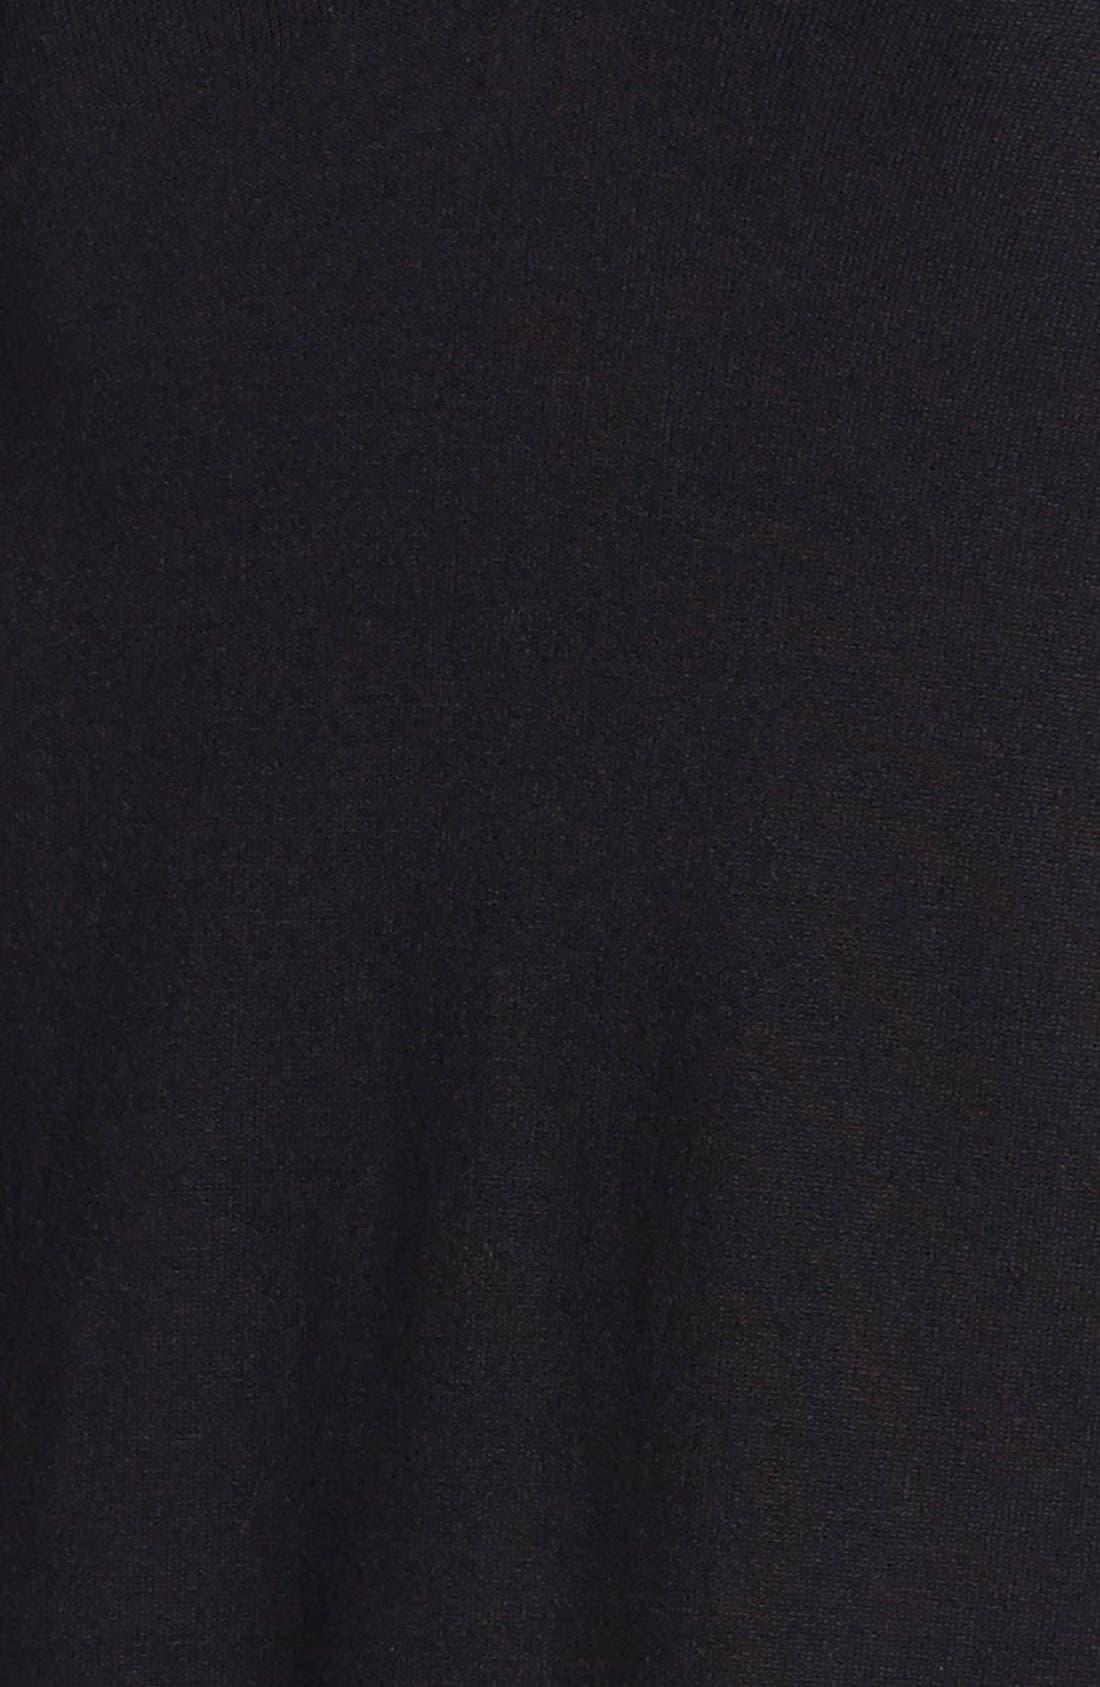 Alternate Image 3  - Vince Camuto Variegated Stripe Tunic Sweater